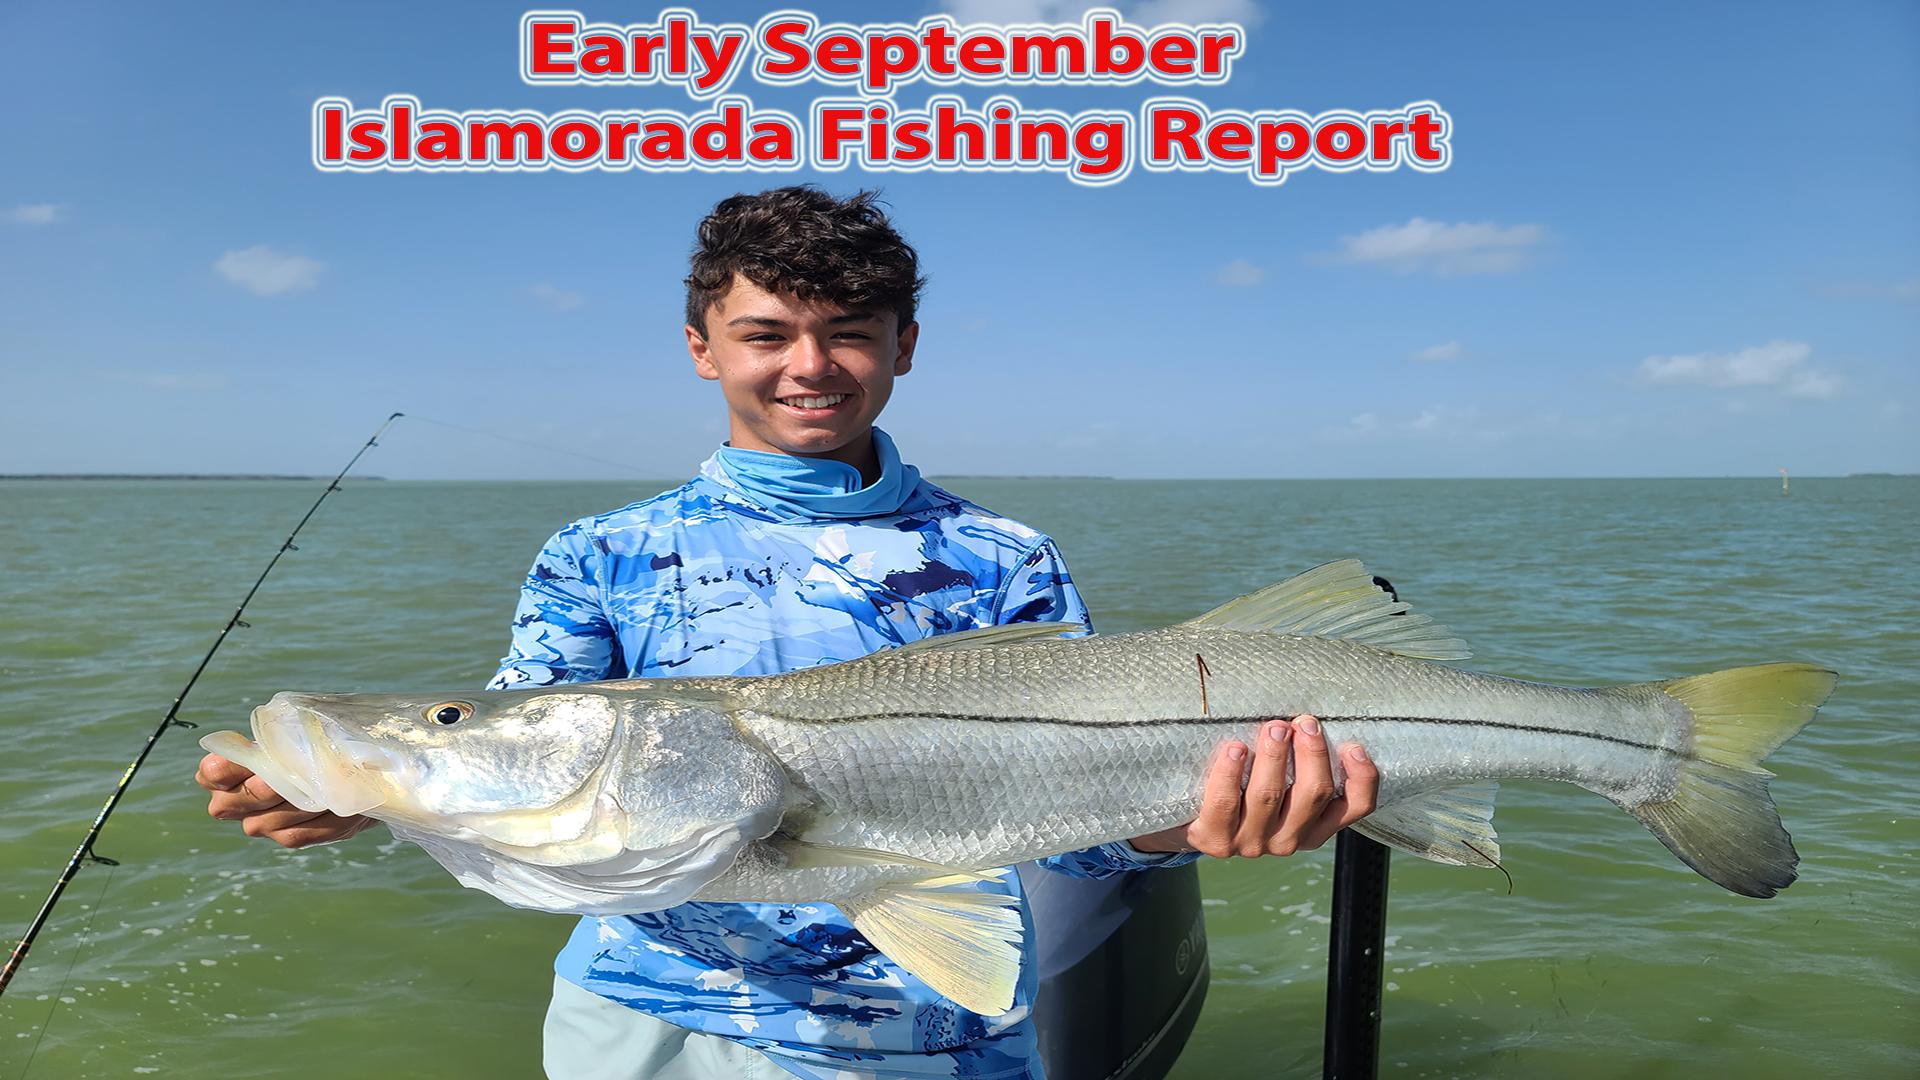 Early September Inshore Fishing Report